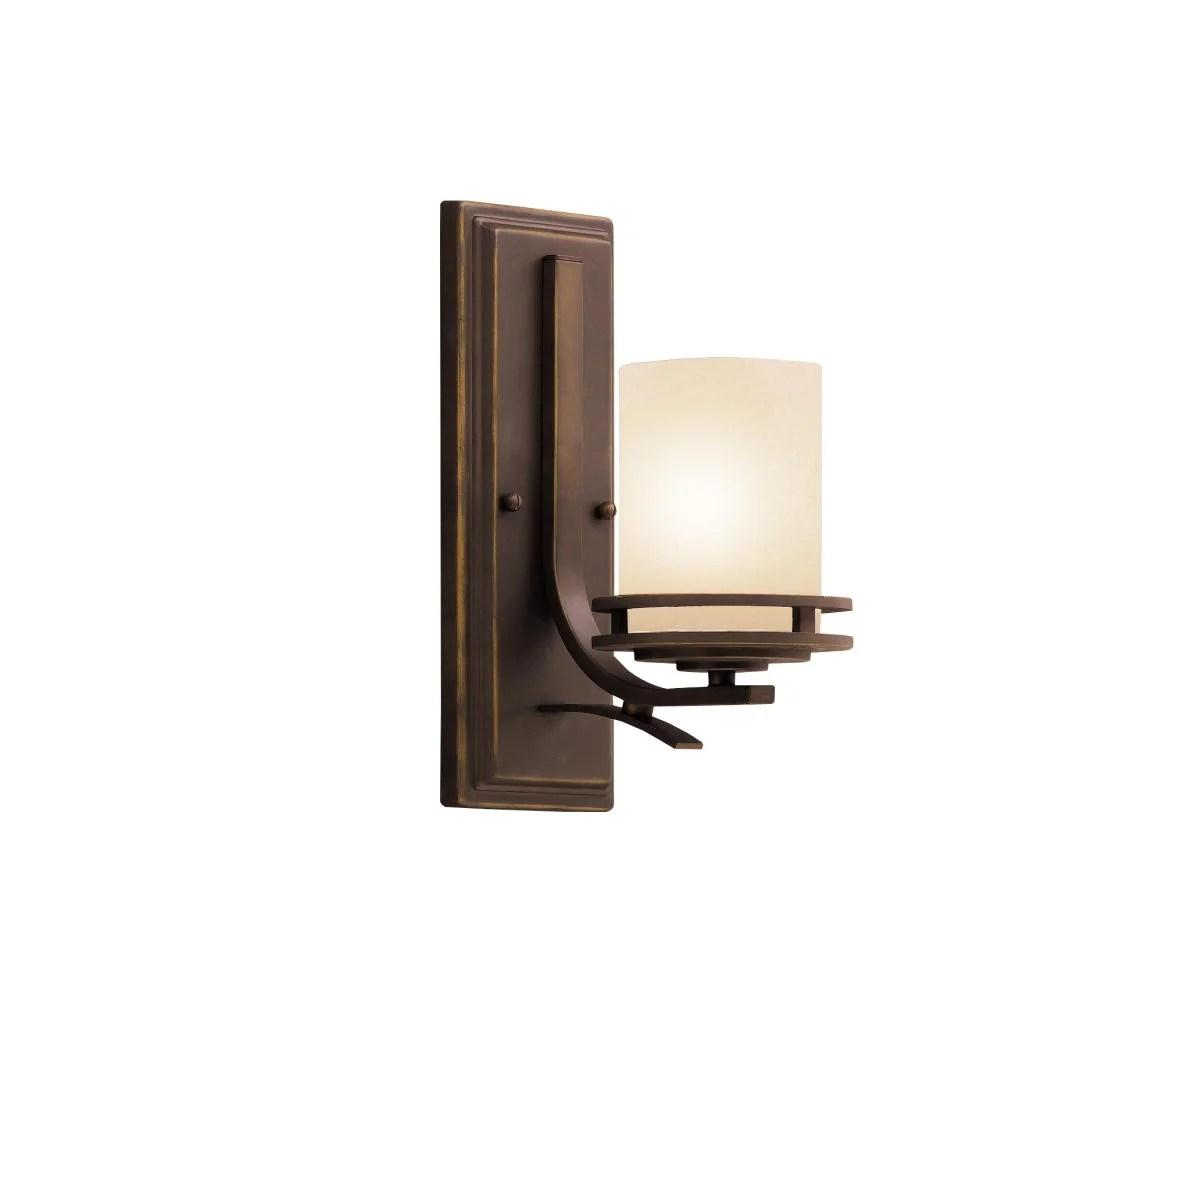 Kichler Hendrik 1 Light Wall Sconce & Reviews